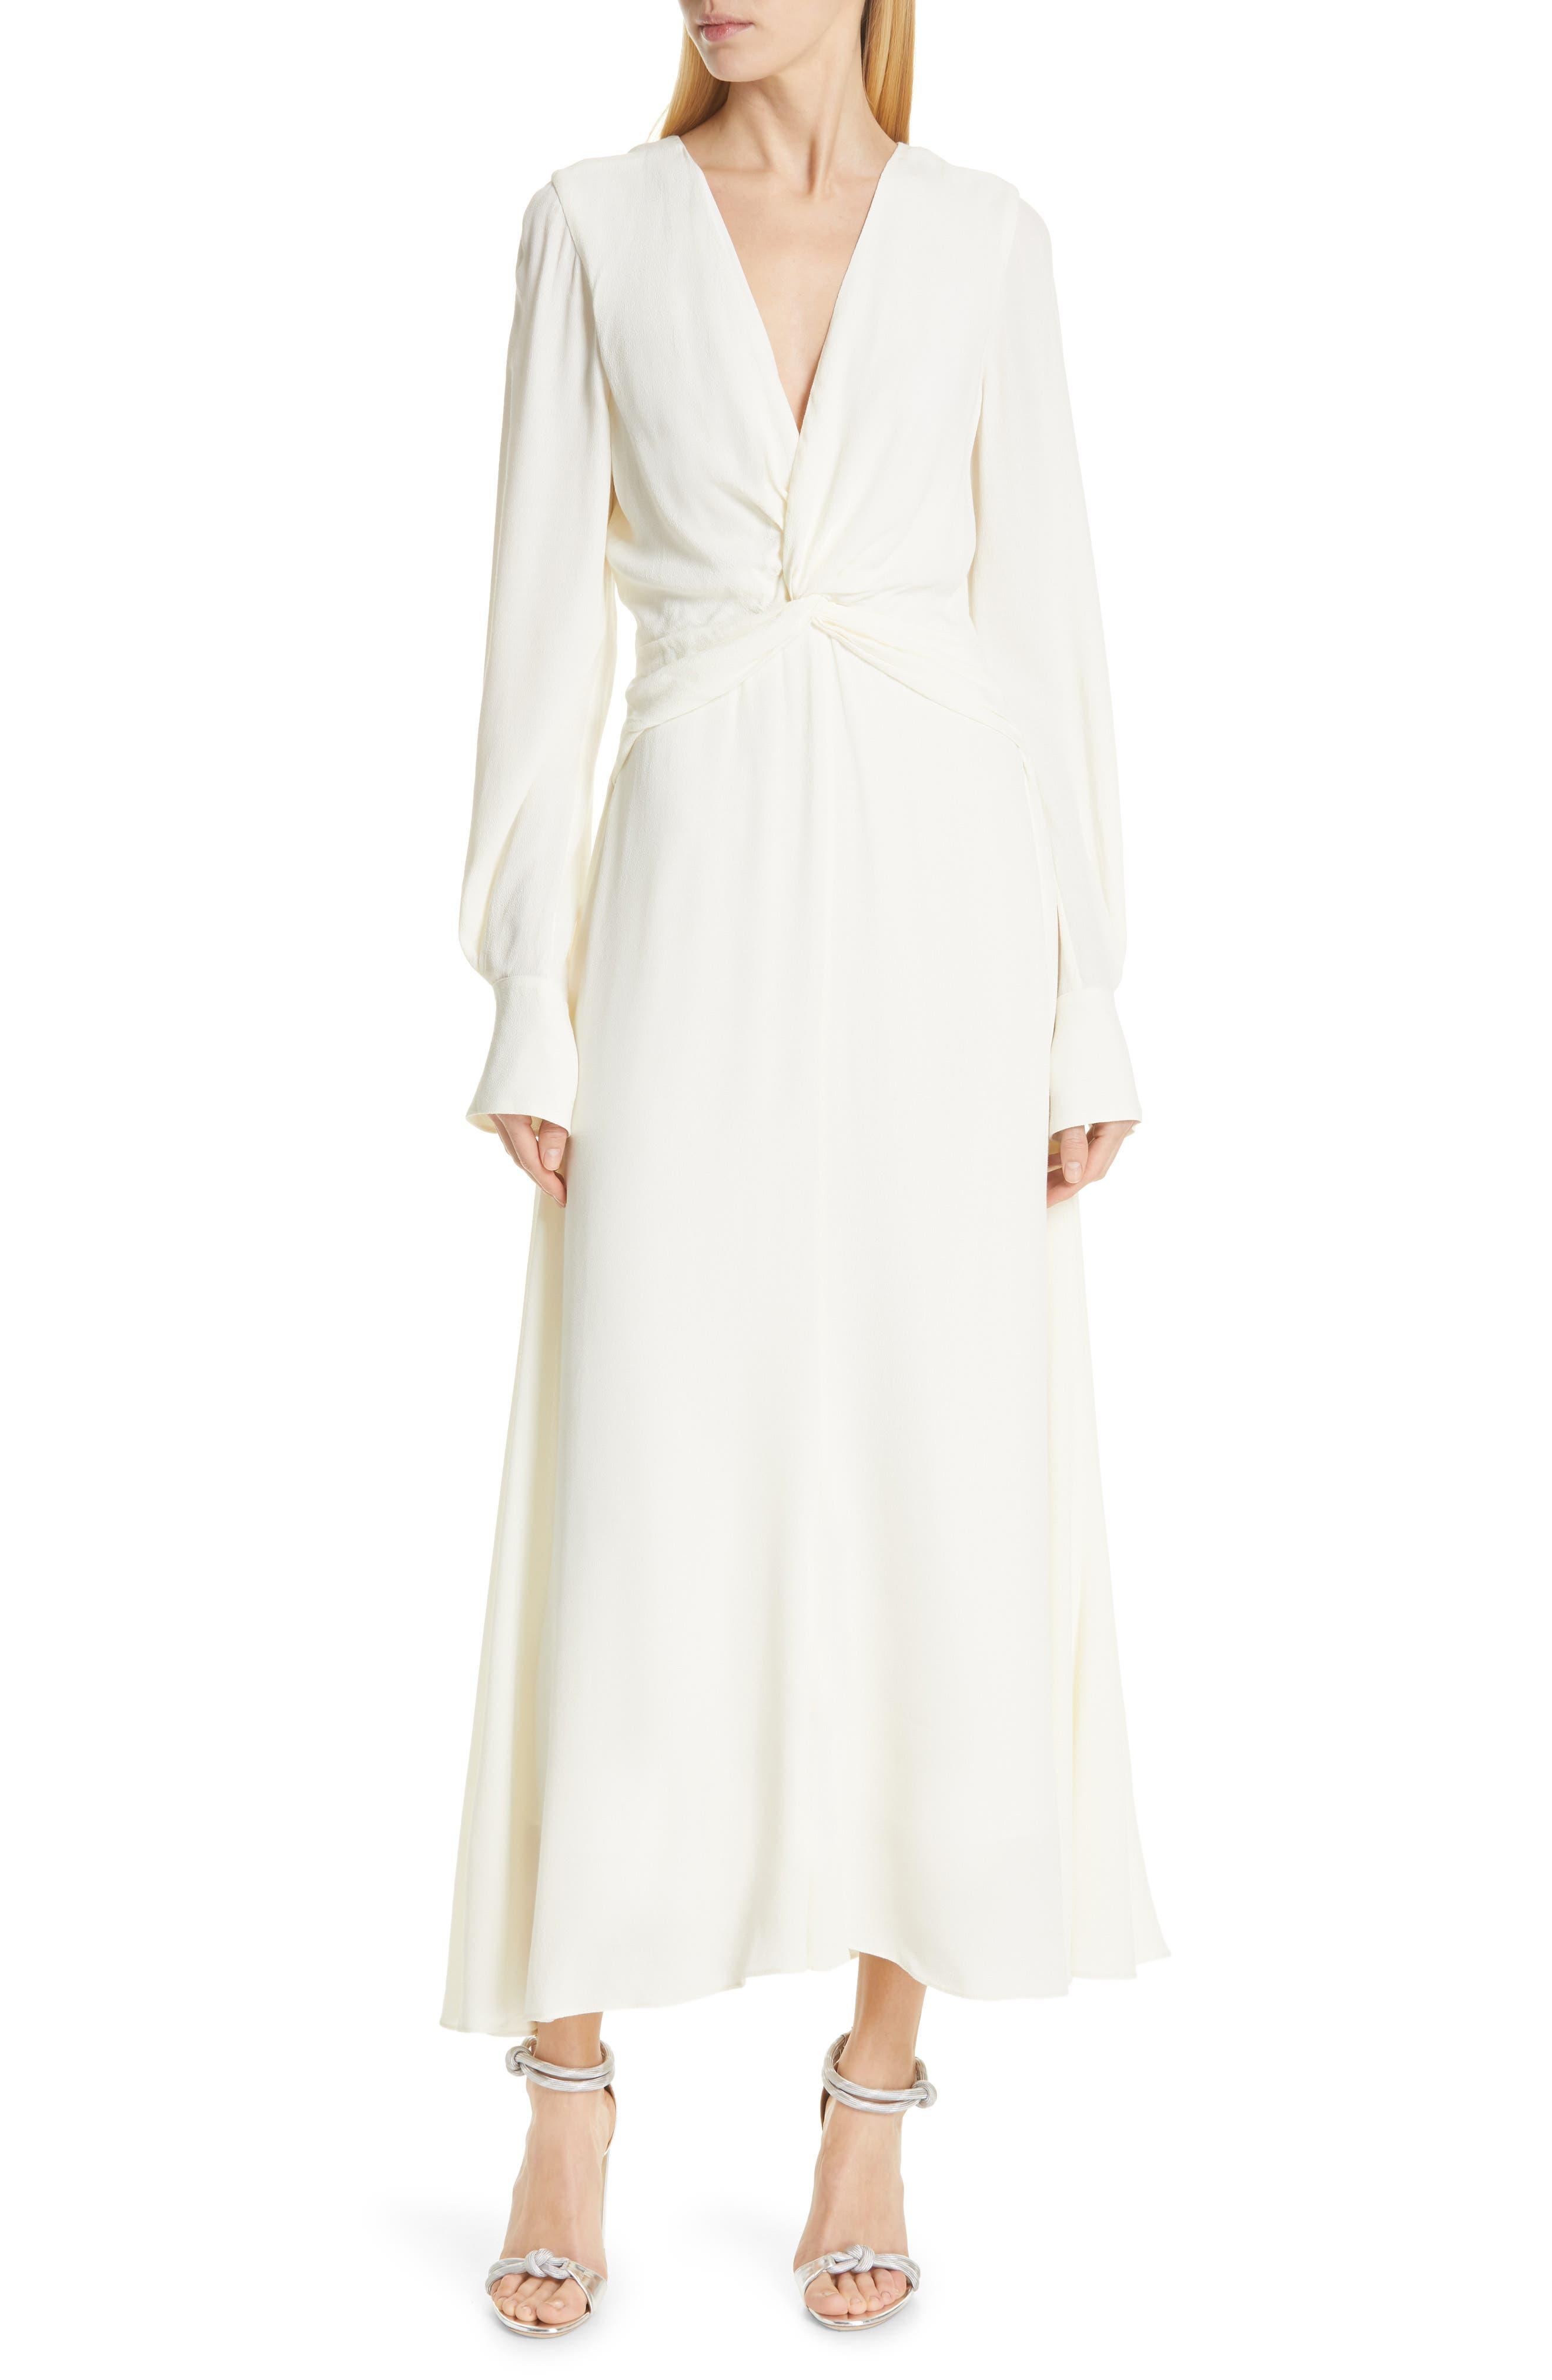 EQUIPMENT Faun Twist Front Dress, Main, color, NATURE WHITE